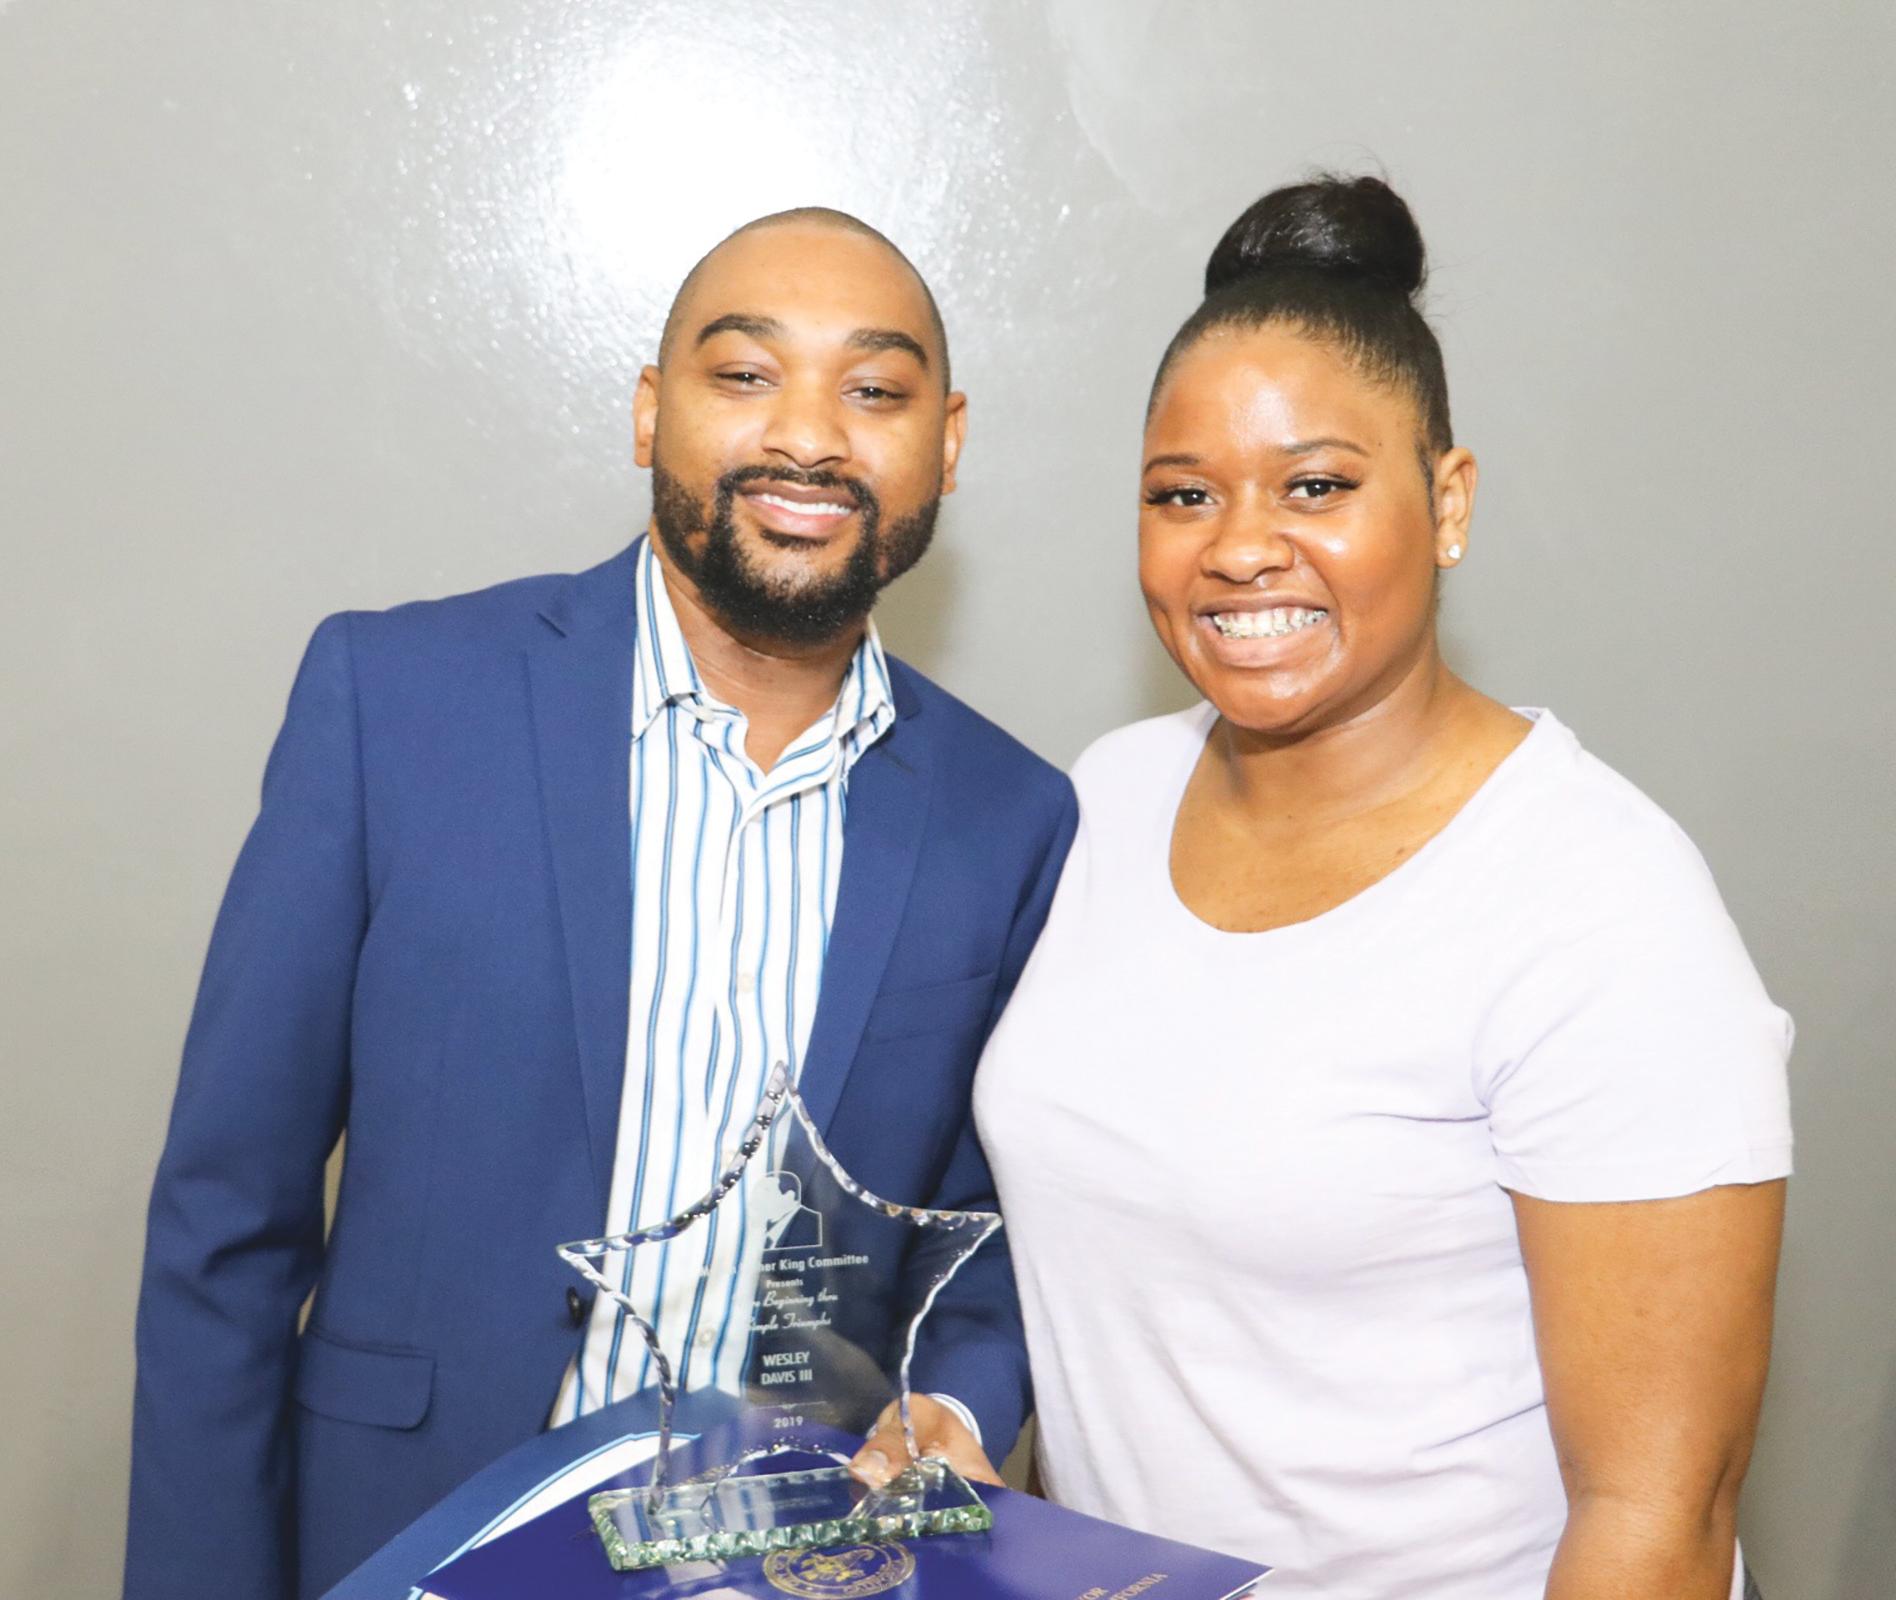 Wesley Davis III (L) accepting the Rev. Martin Luther King Jr. & Stephanie W. Campbell-Chatman Community Service Award. (Carrington Prichett photo)